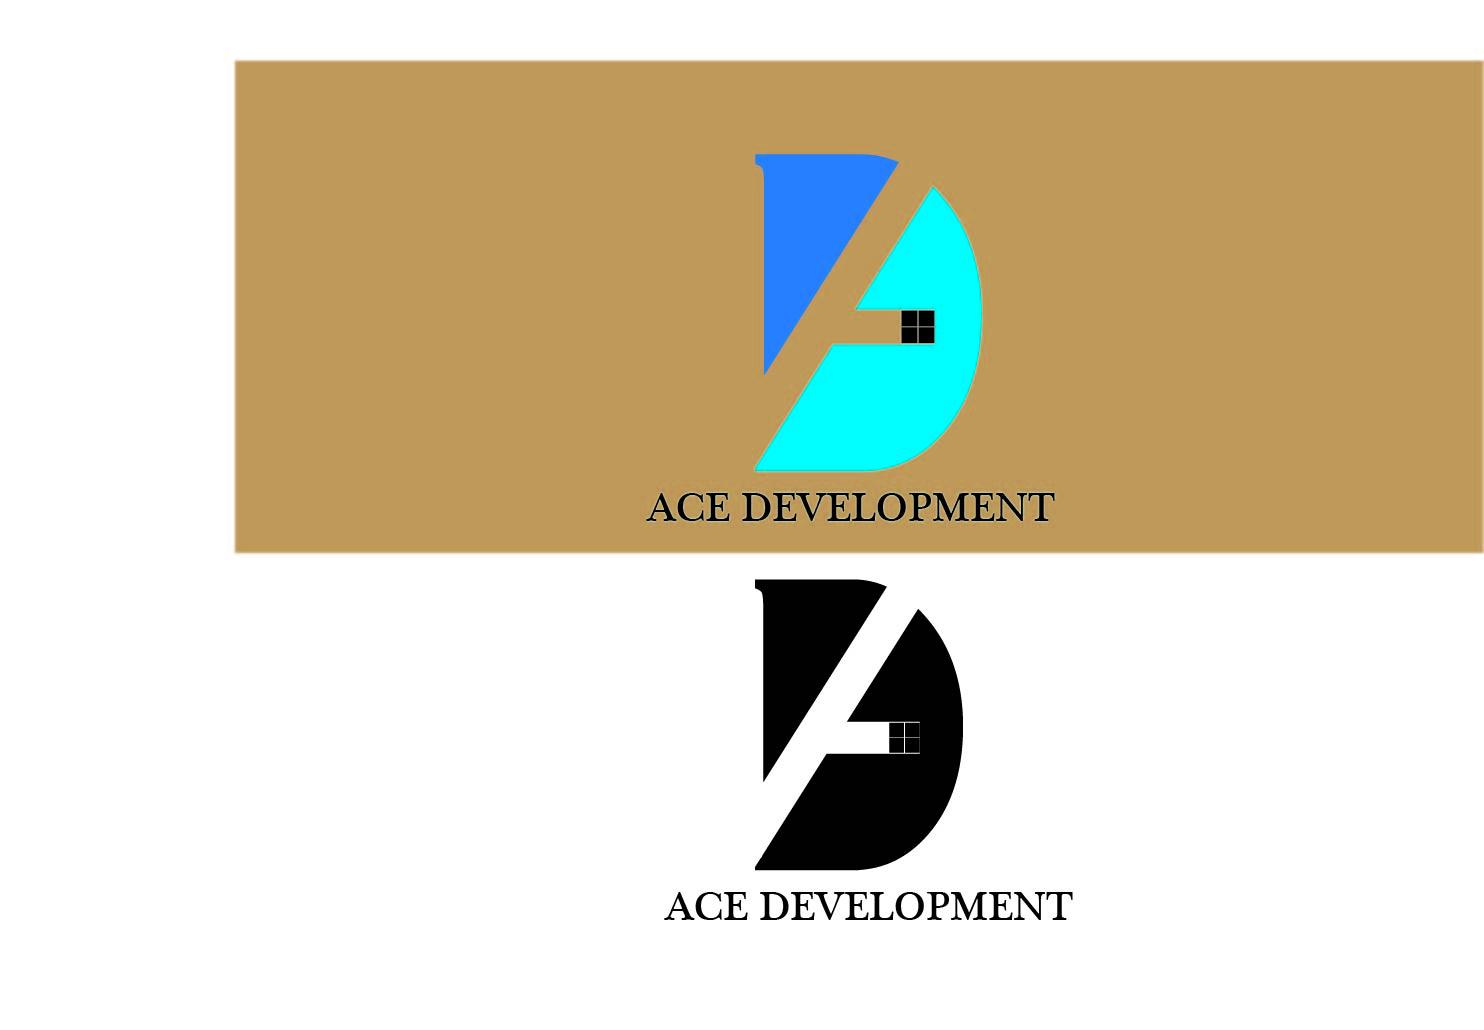 Logo Design by Arqui Acosta - Entry No. 40 in the Logo Design Contest Fun Logo Design for Ace development.